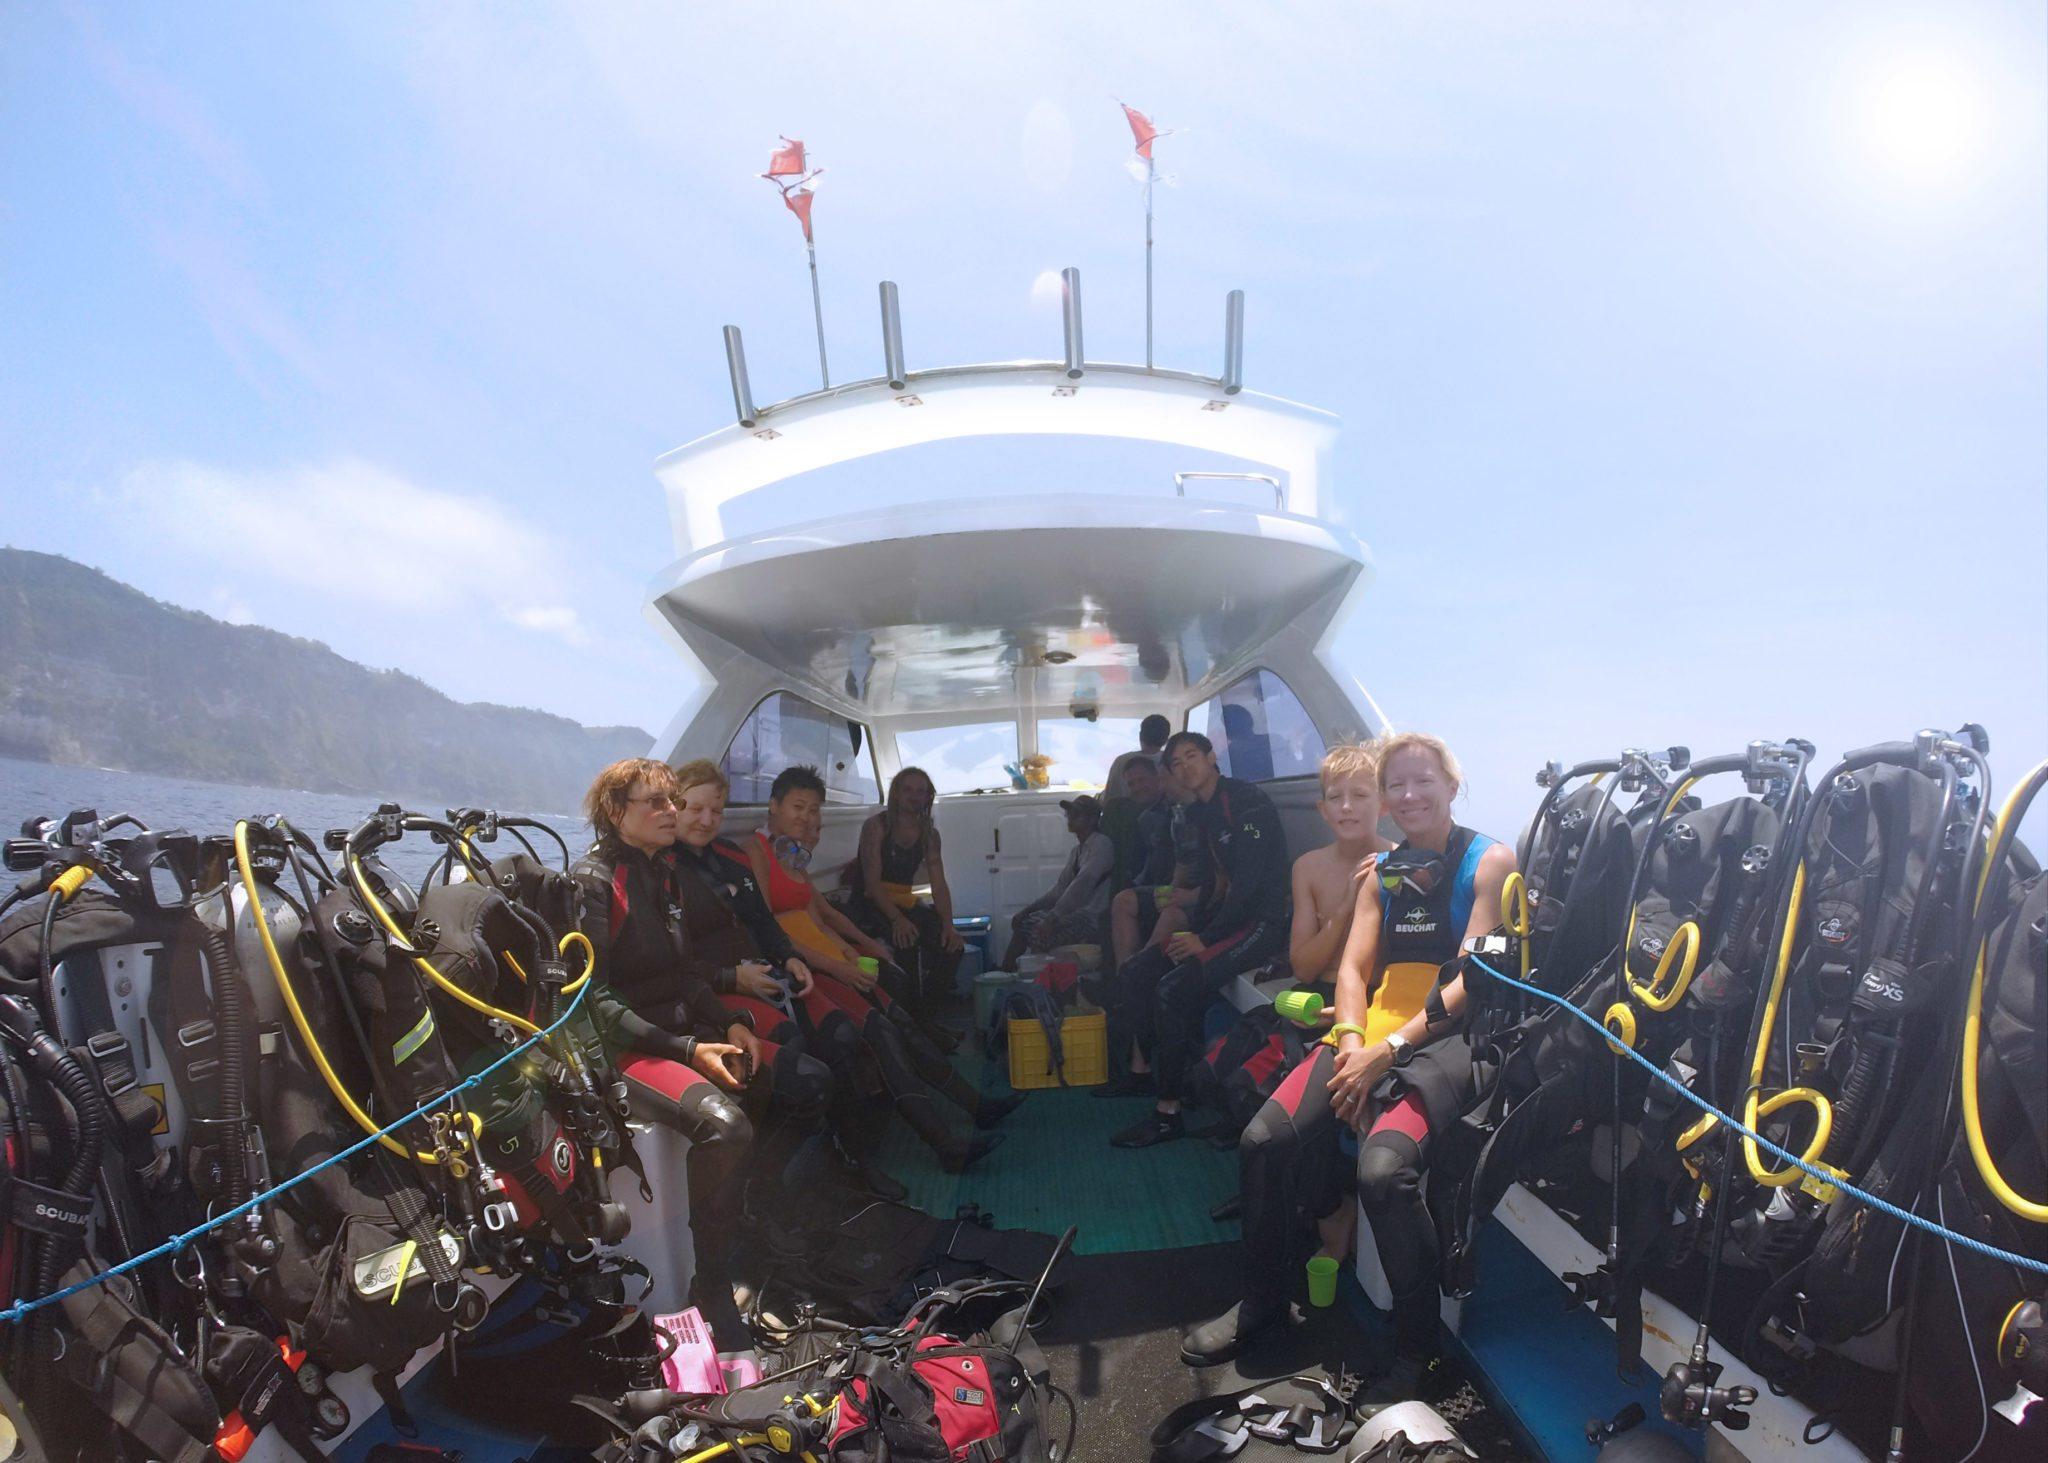 Scuba Diving In Bali Indonesia | Dive Travel Indonesia